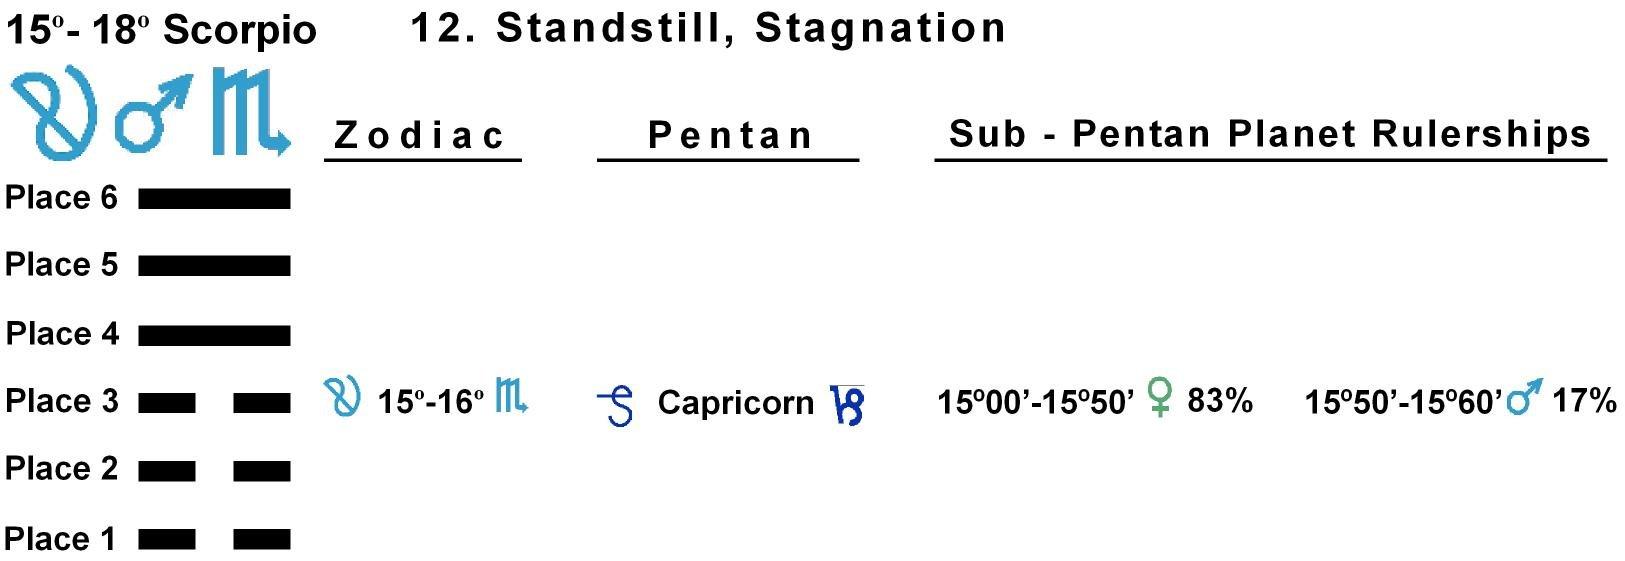 Pent-lines-08SC 15-16 Hx-12 Standstill